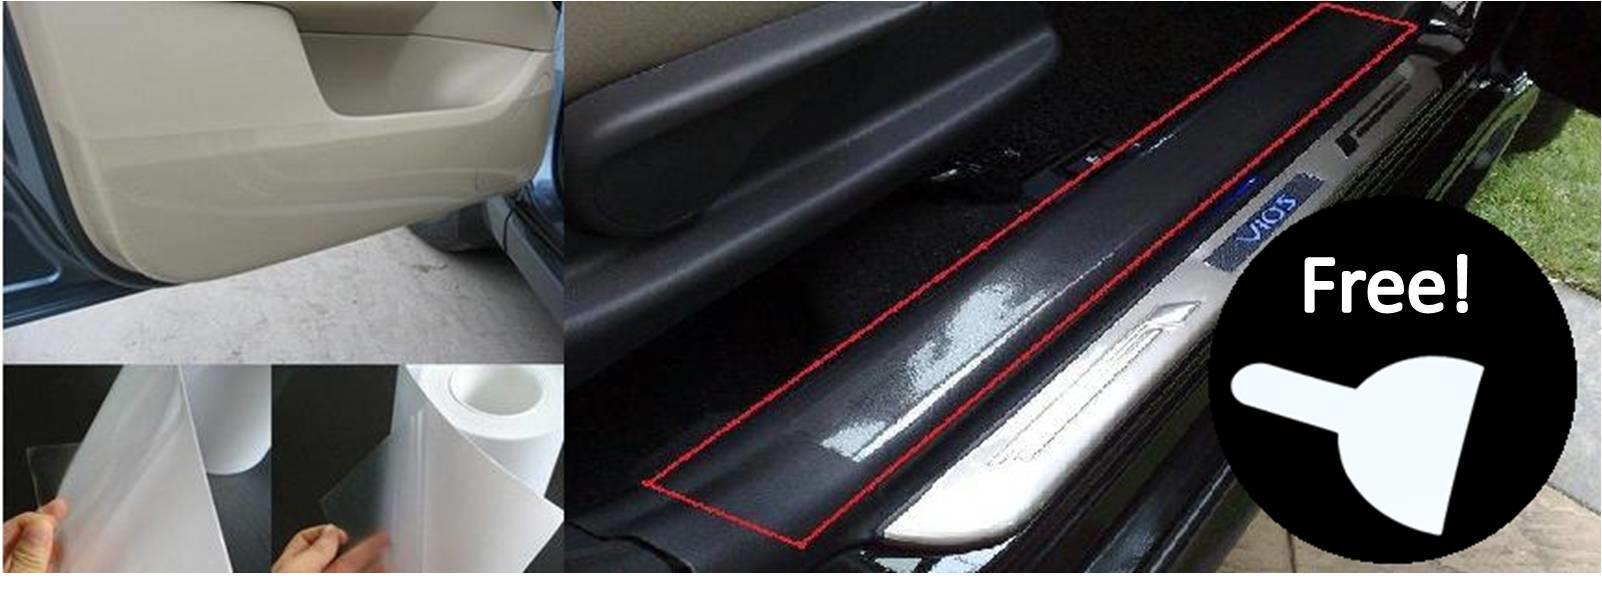 Car door step interior protection fil end 1 2 2020 1 23 pm - Automotive interior protective film ...